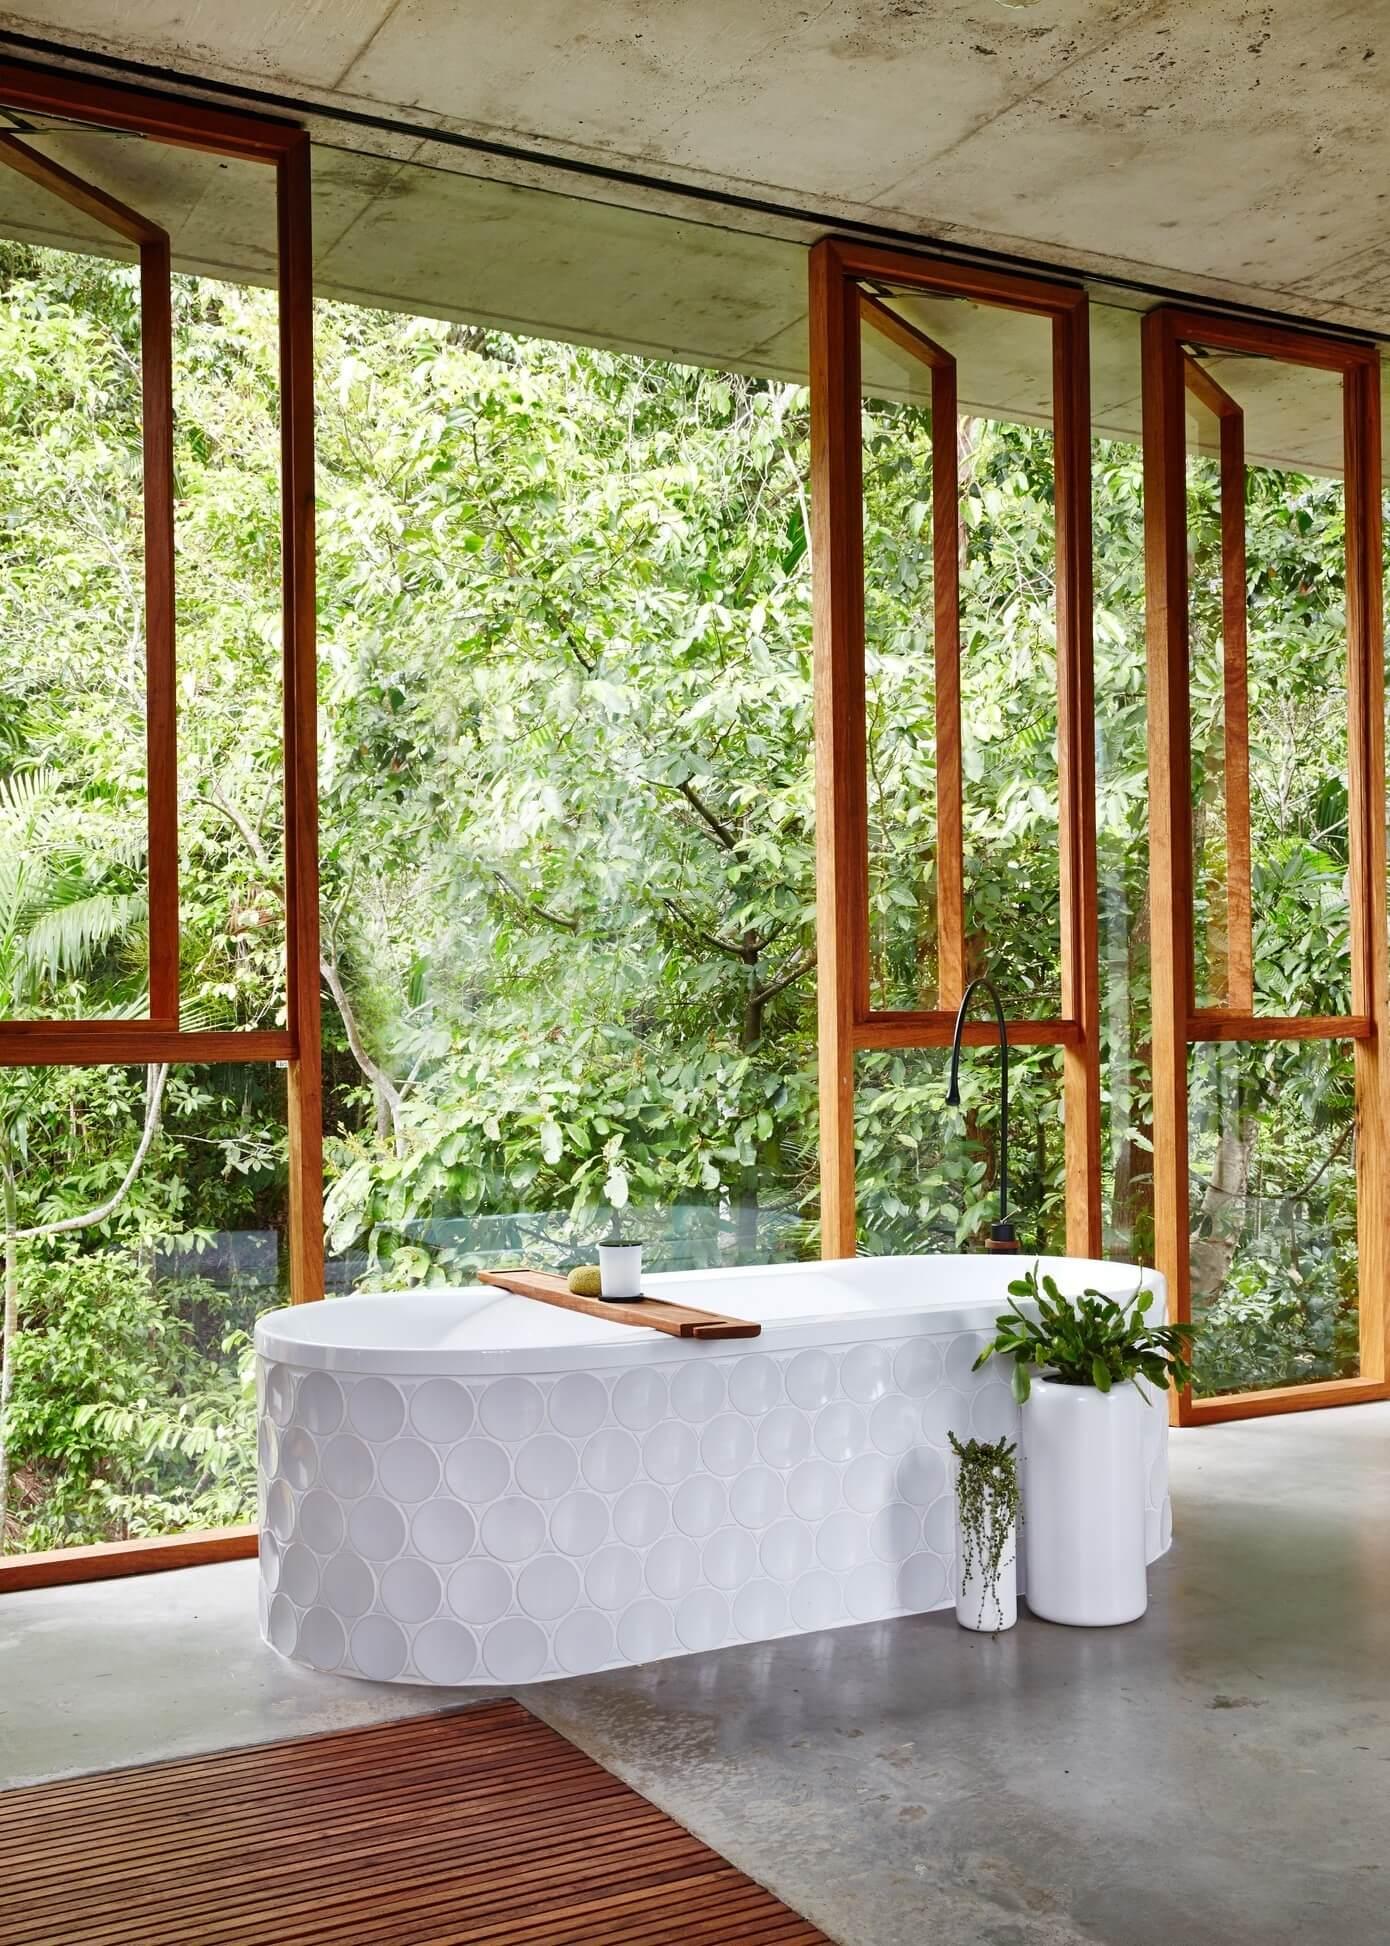 planchonella-house-jesse-bennett-architect-18